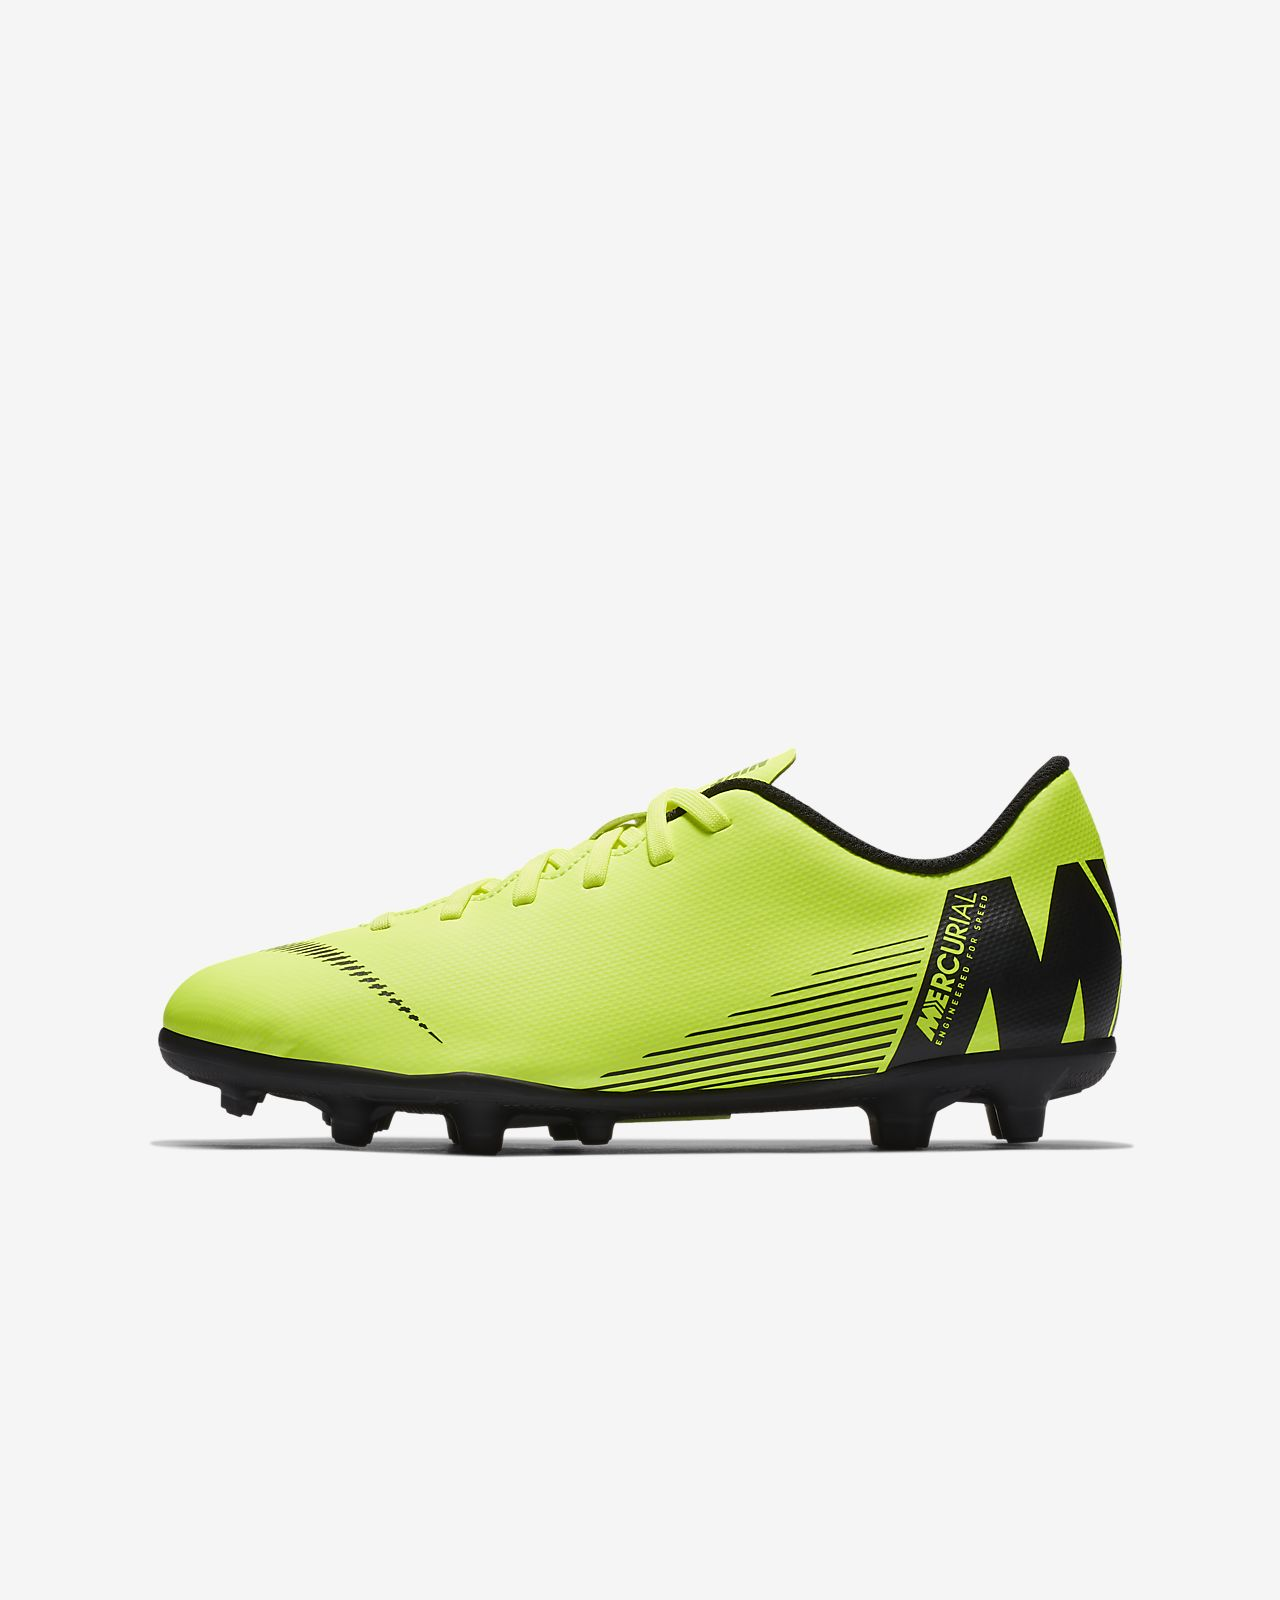 new product 34664 5bbb6 Older Kids Multi-Ground Football Boot. Nike Jr. Vapor 12 Club MG